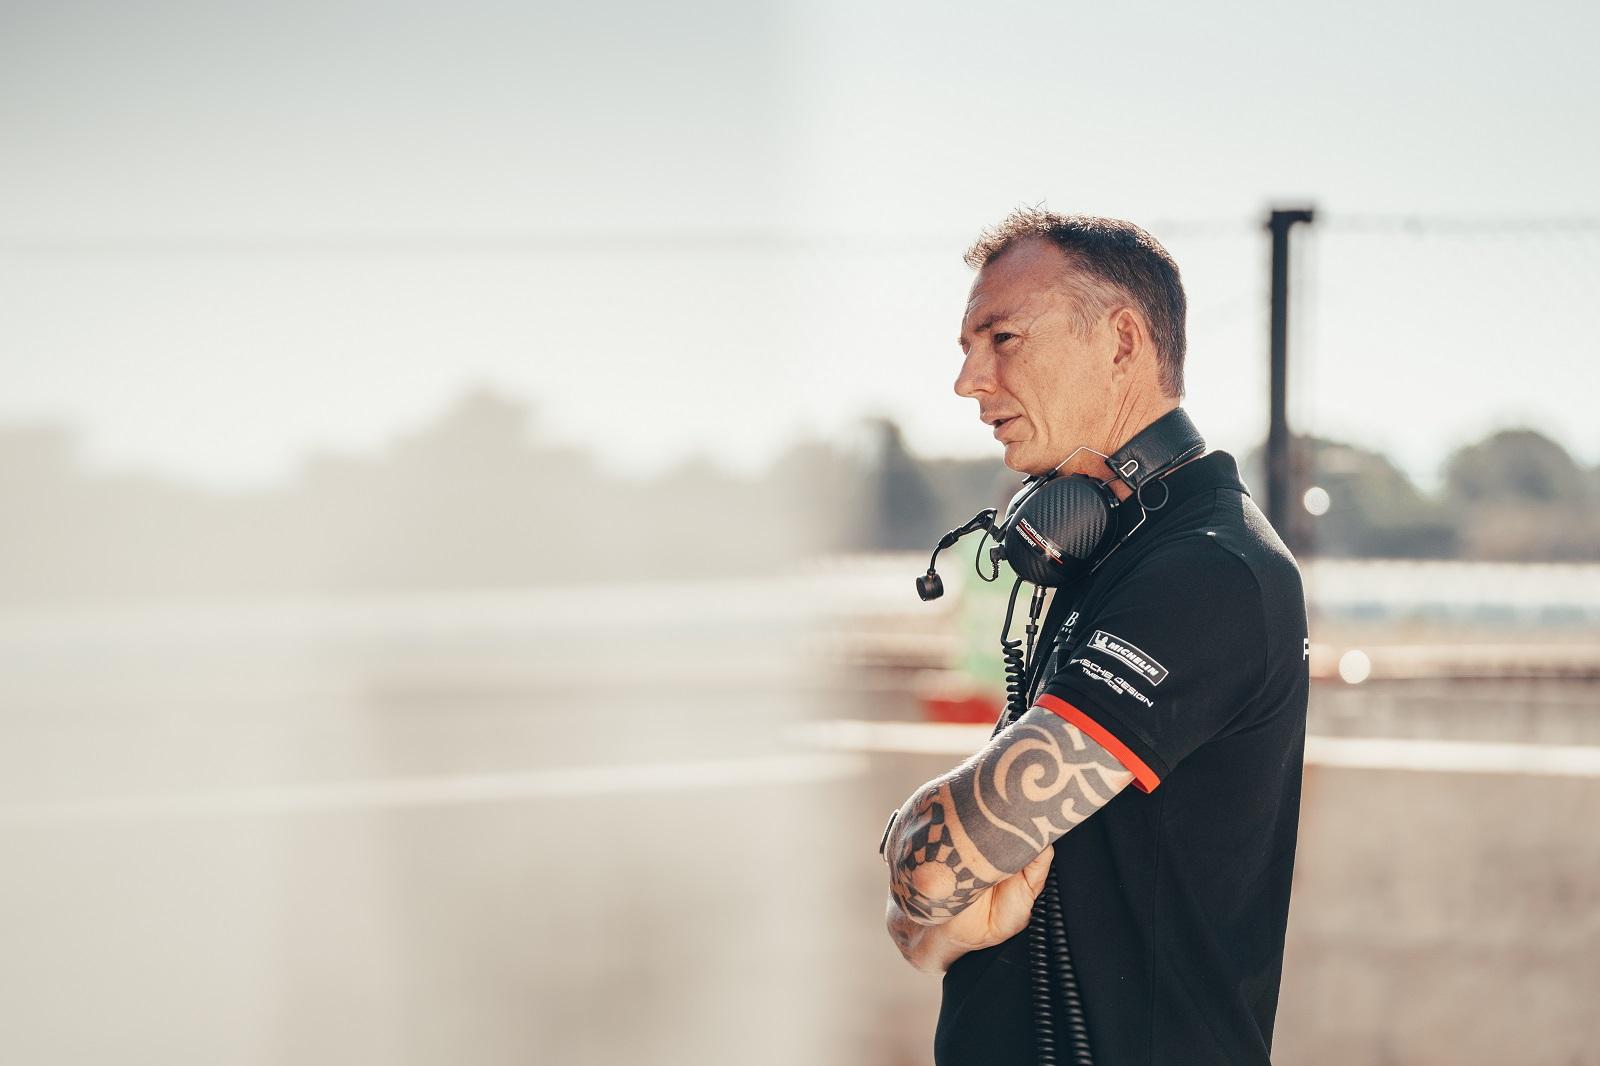 Амиэль Линдсей, менеджер команды Формула Е